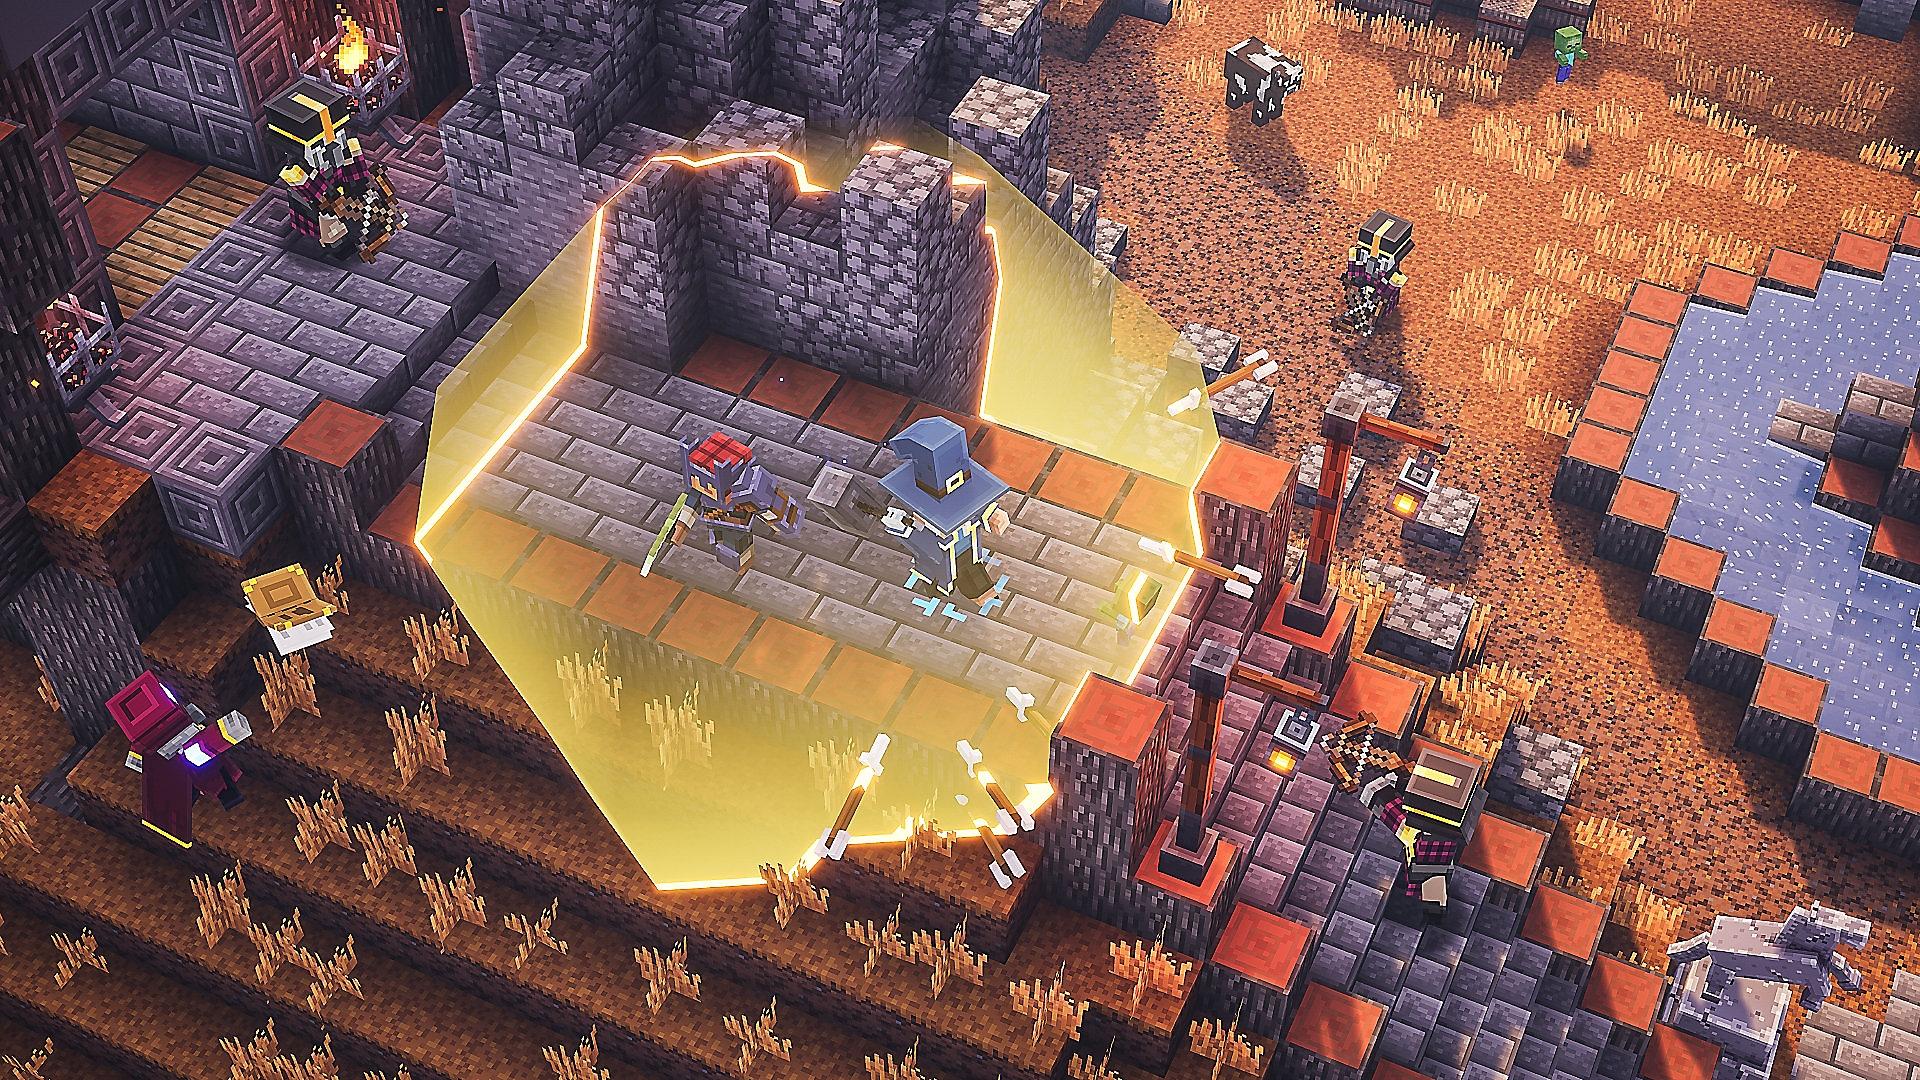 Minecraft Dungeons - Gallery Screenshot 5